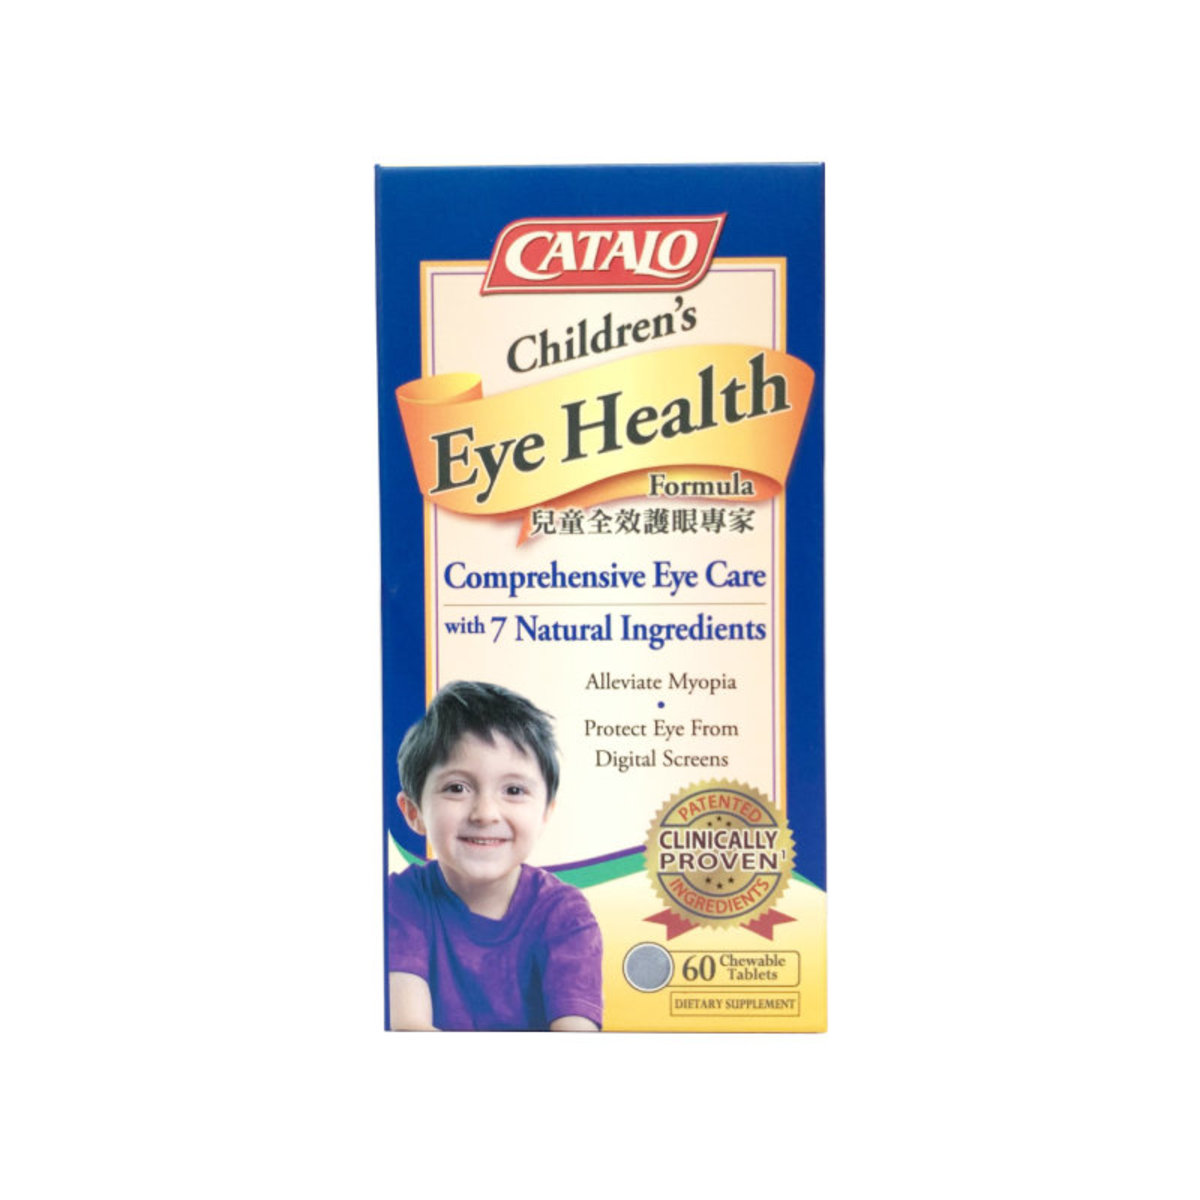 Children's Eye Health Formula 60 Chewable Tablets (EXP. 2020. 11) (810399022725)